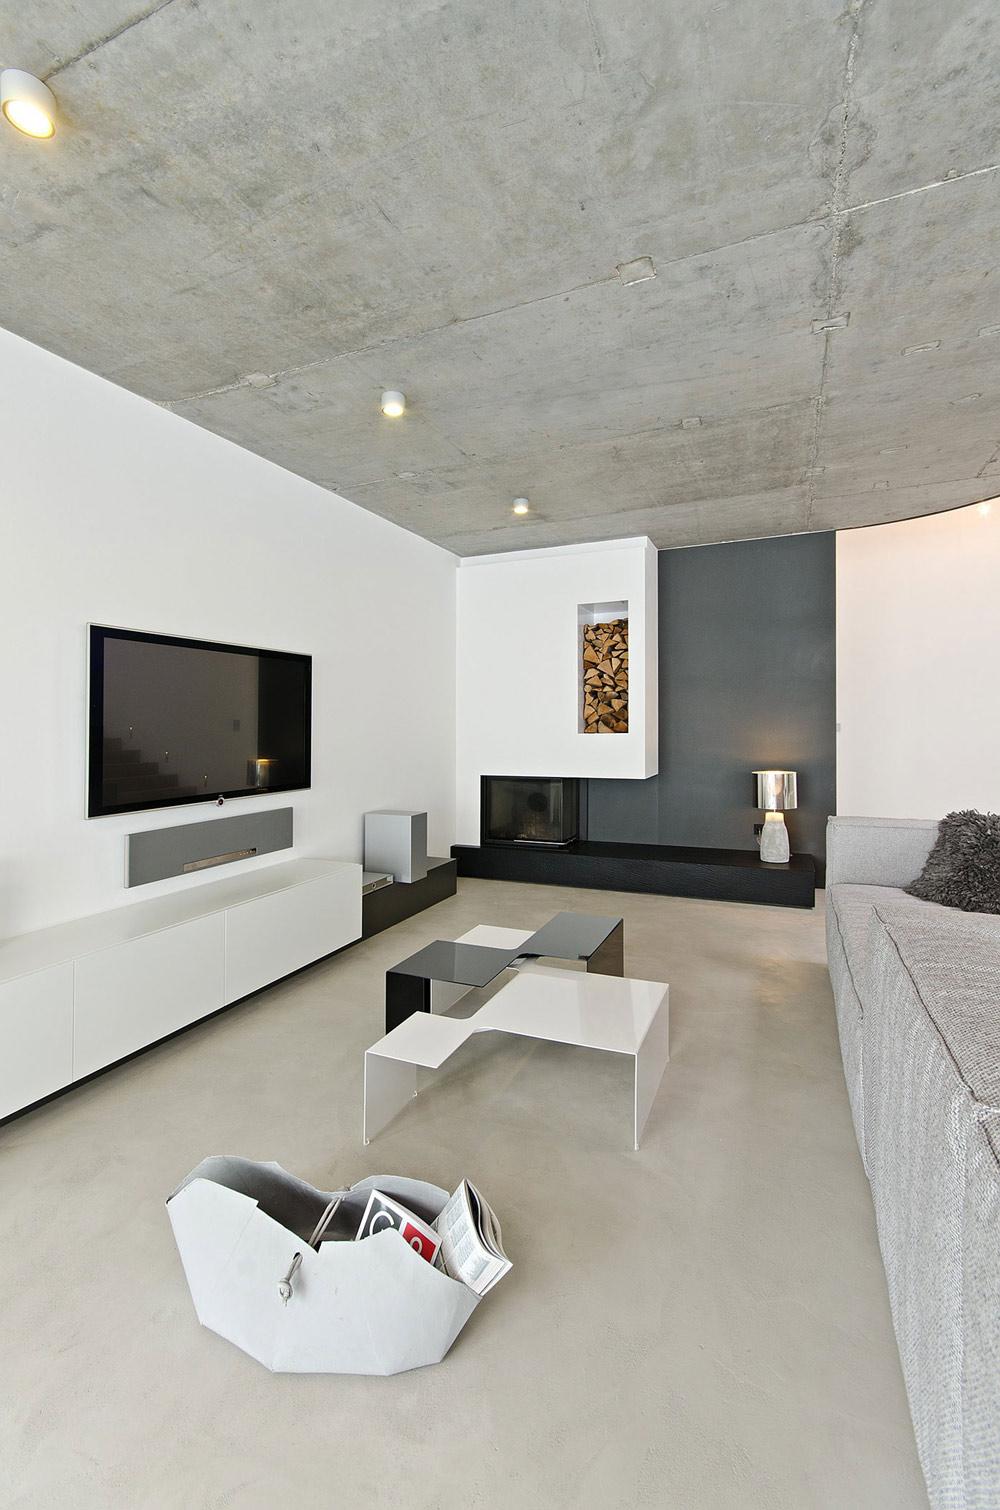 Modern Fireplace, Wood Store, Concrete Interior Design in Osice, Czech Republic